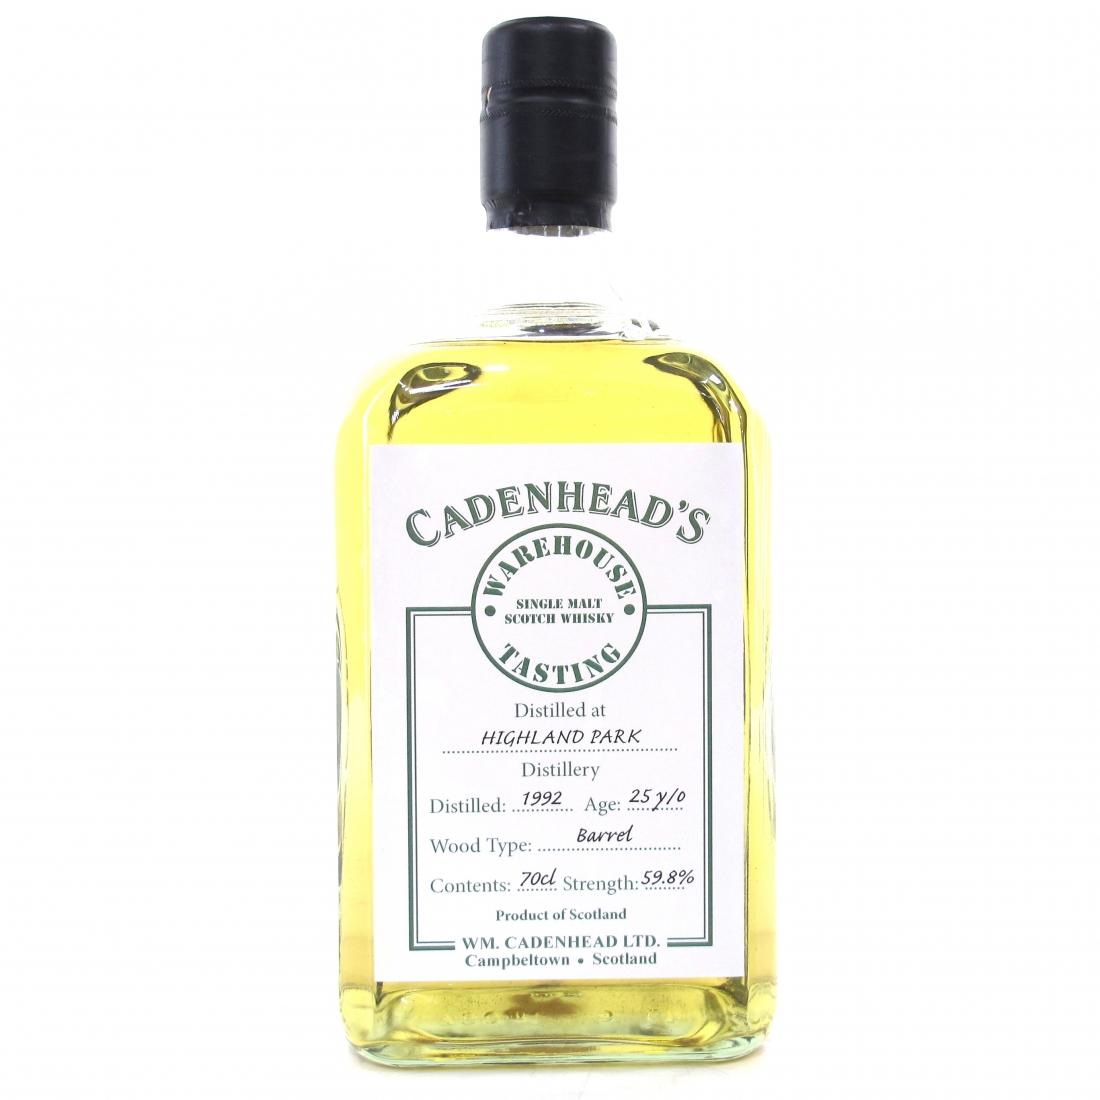 Highland Park 1992 Cadenhead's 25 Year Old / Warehouse Tasting